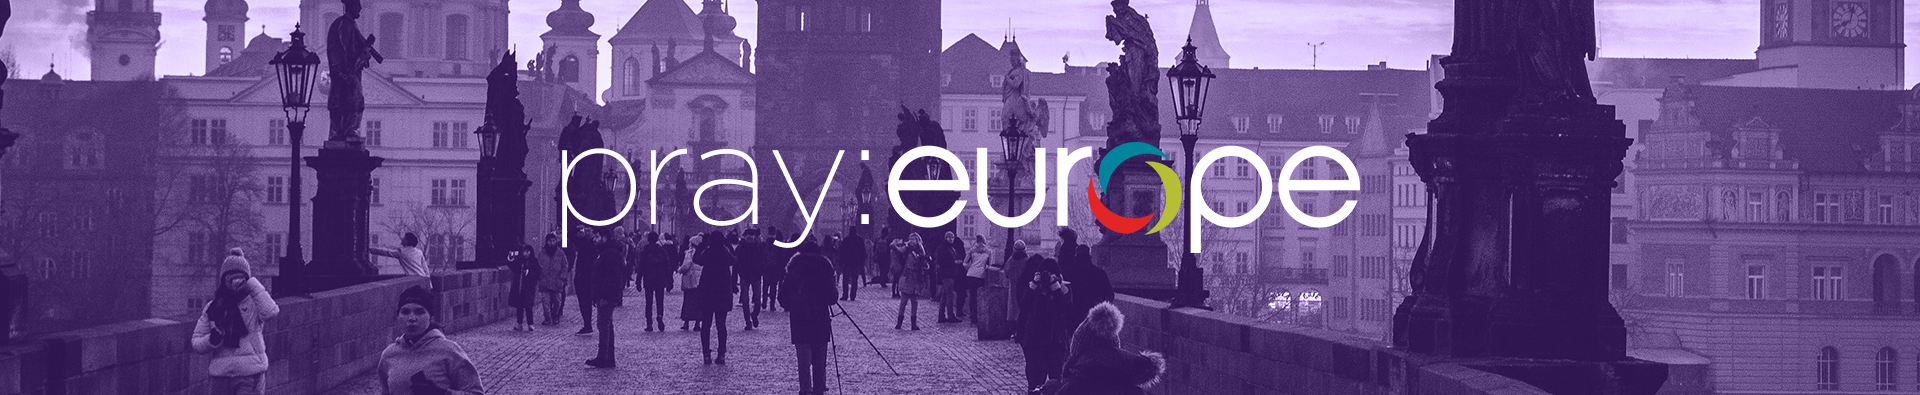 Pray Europe Footer.png